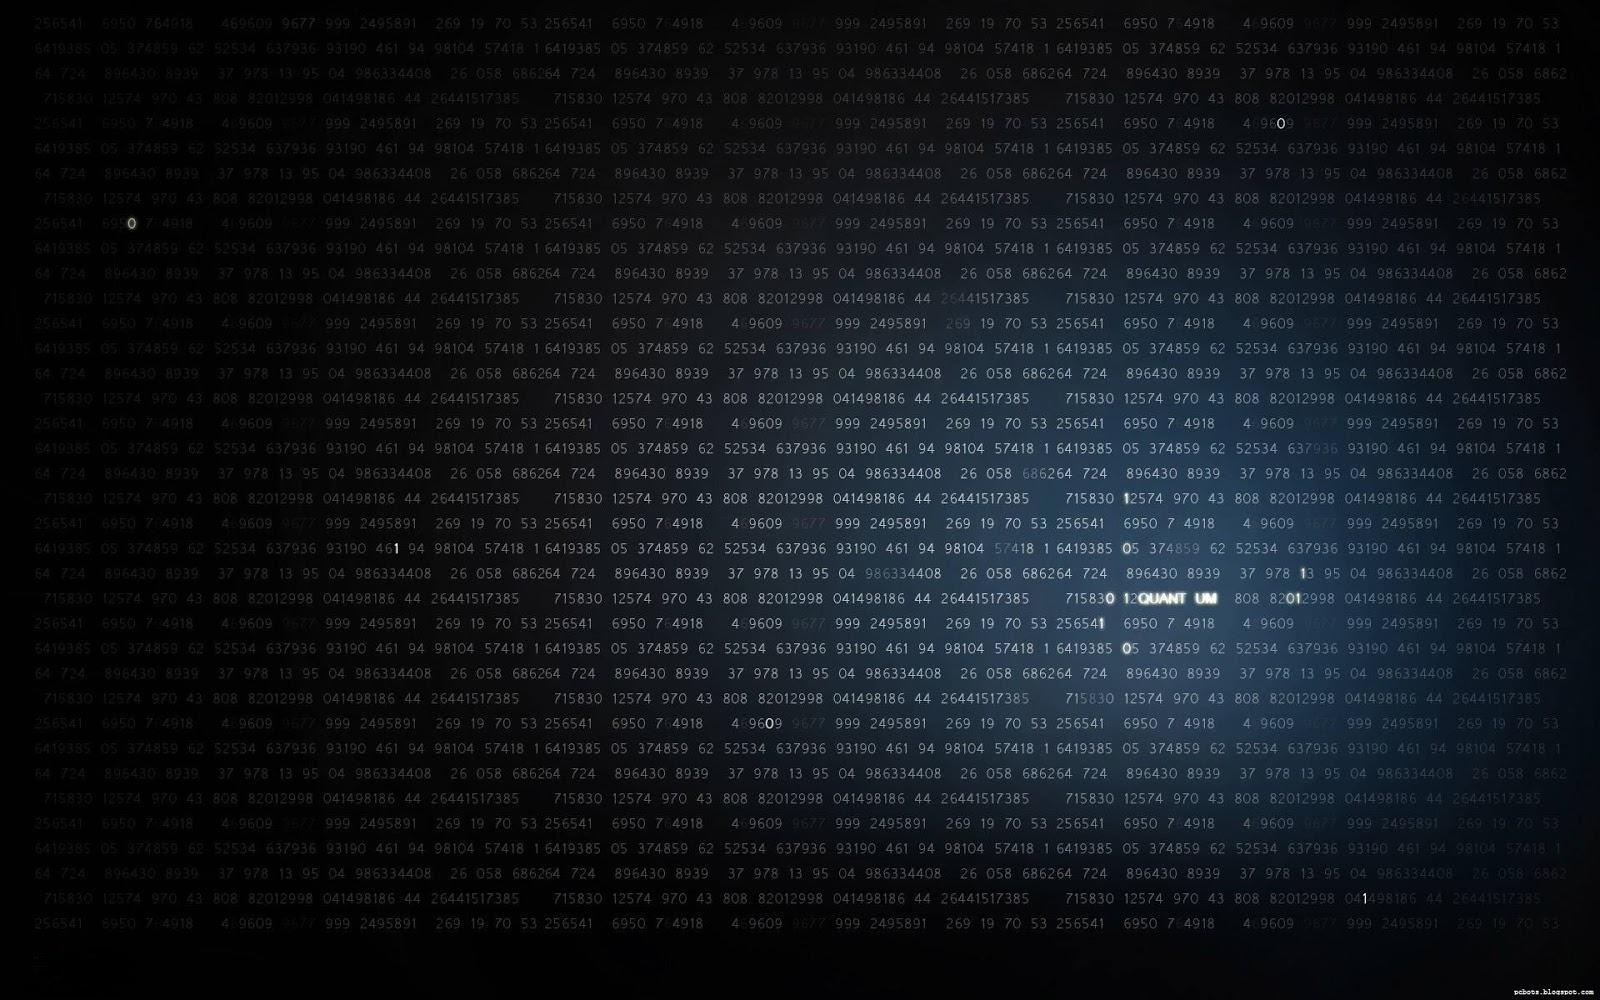 Hackers Wallpaper HD By Pcbots   Part I PCbots Labs Blog 1600x1000